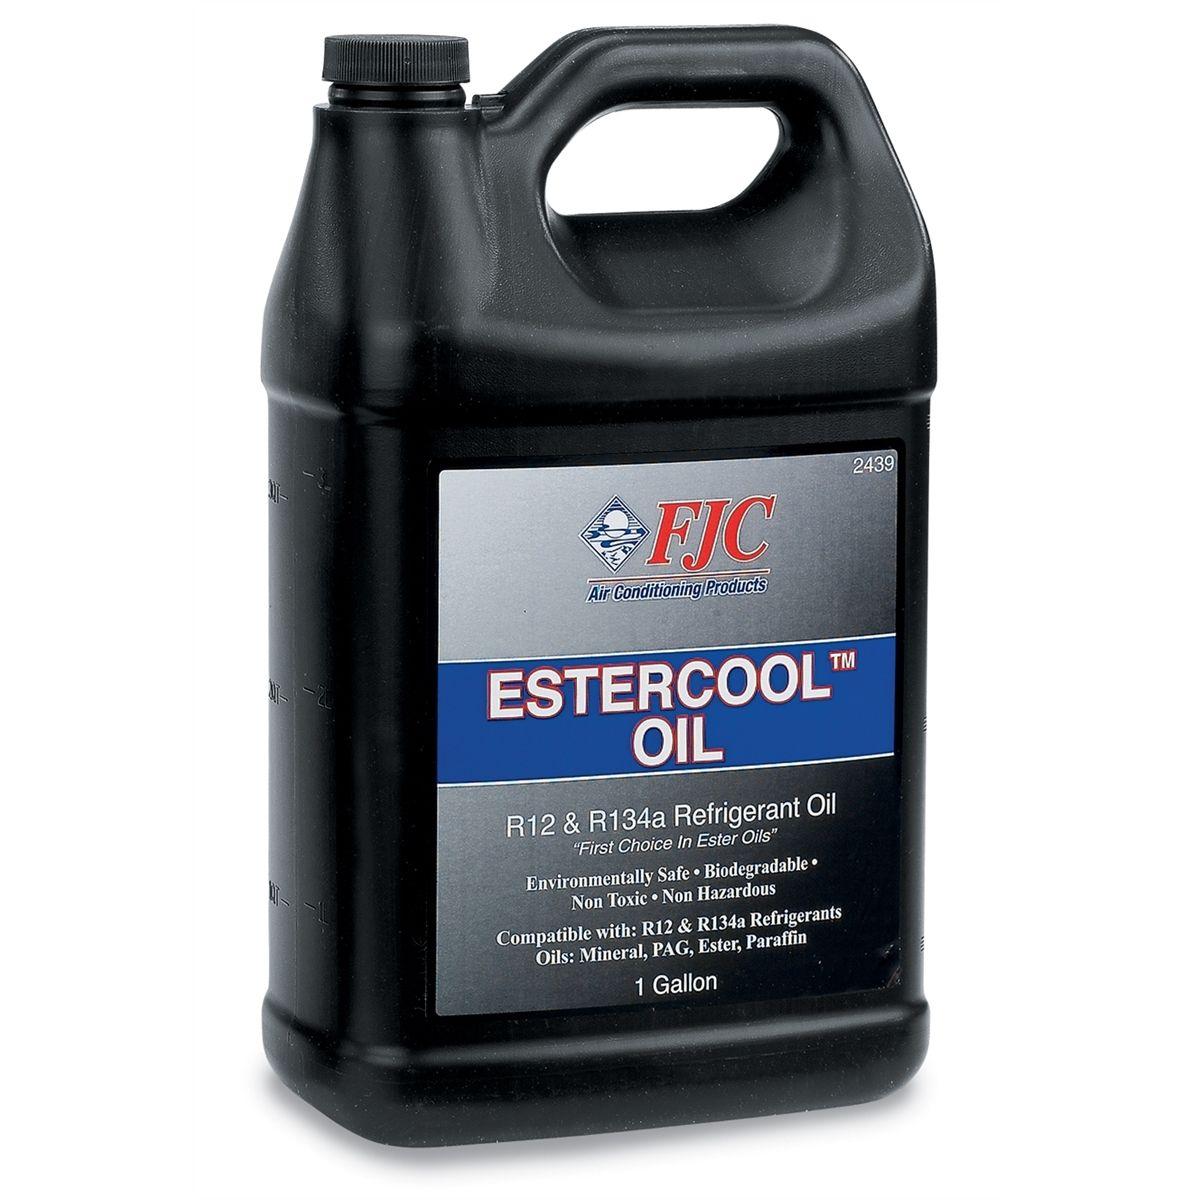 1 Emailoils Contact Usco Ltd Mail: 1 Gallon FJC Estercool Refrigerant Oil